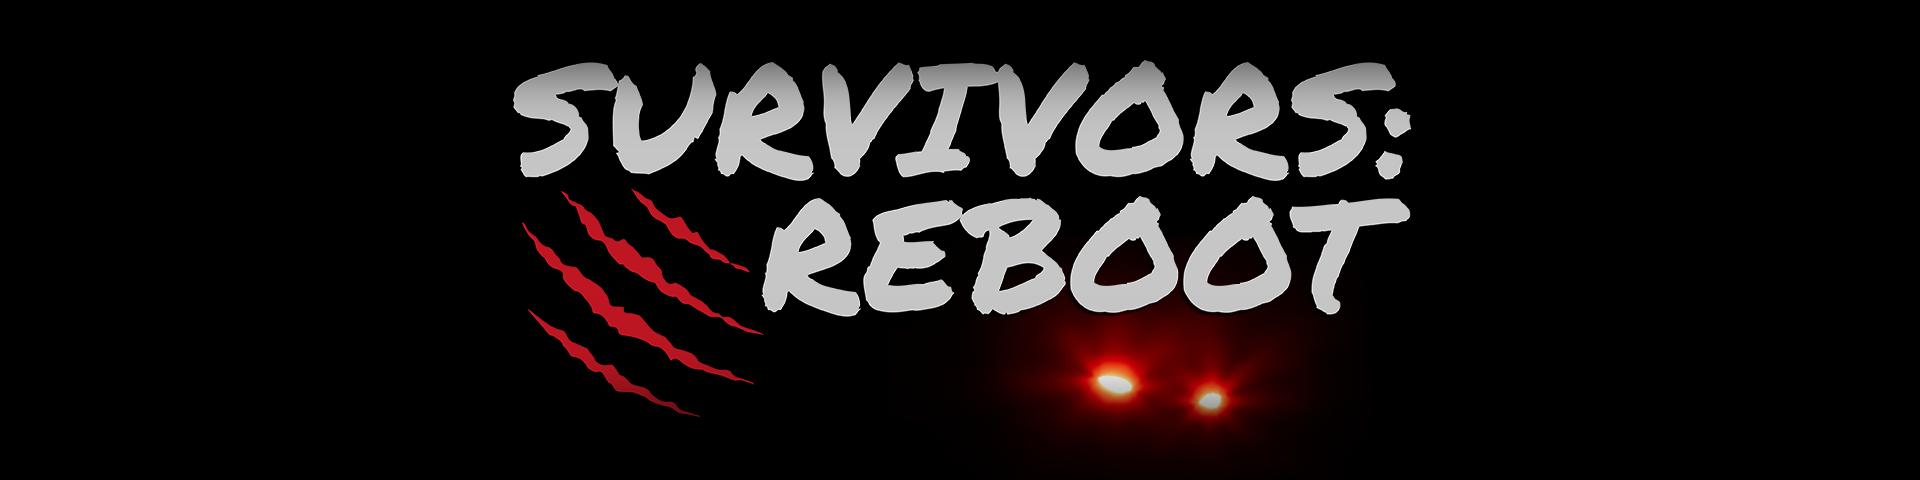 Survivors: Reboot